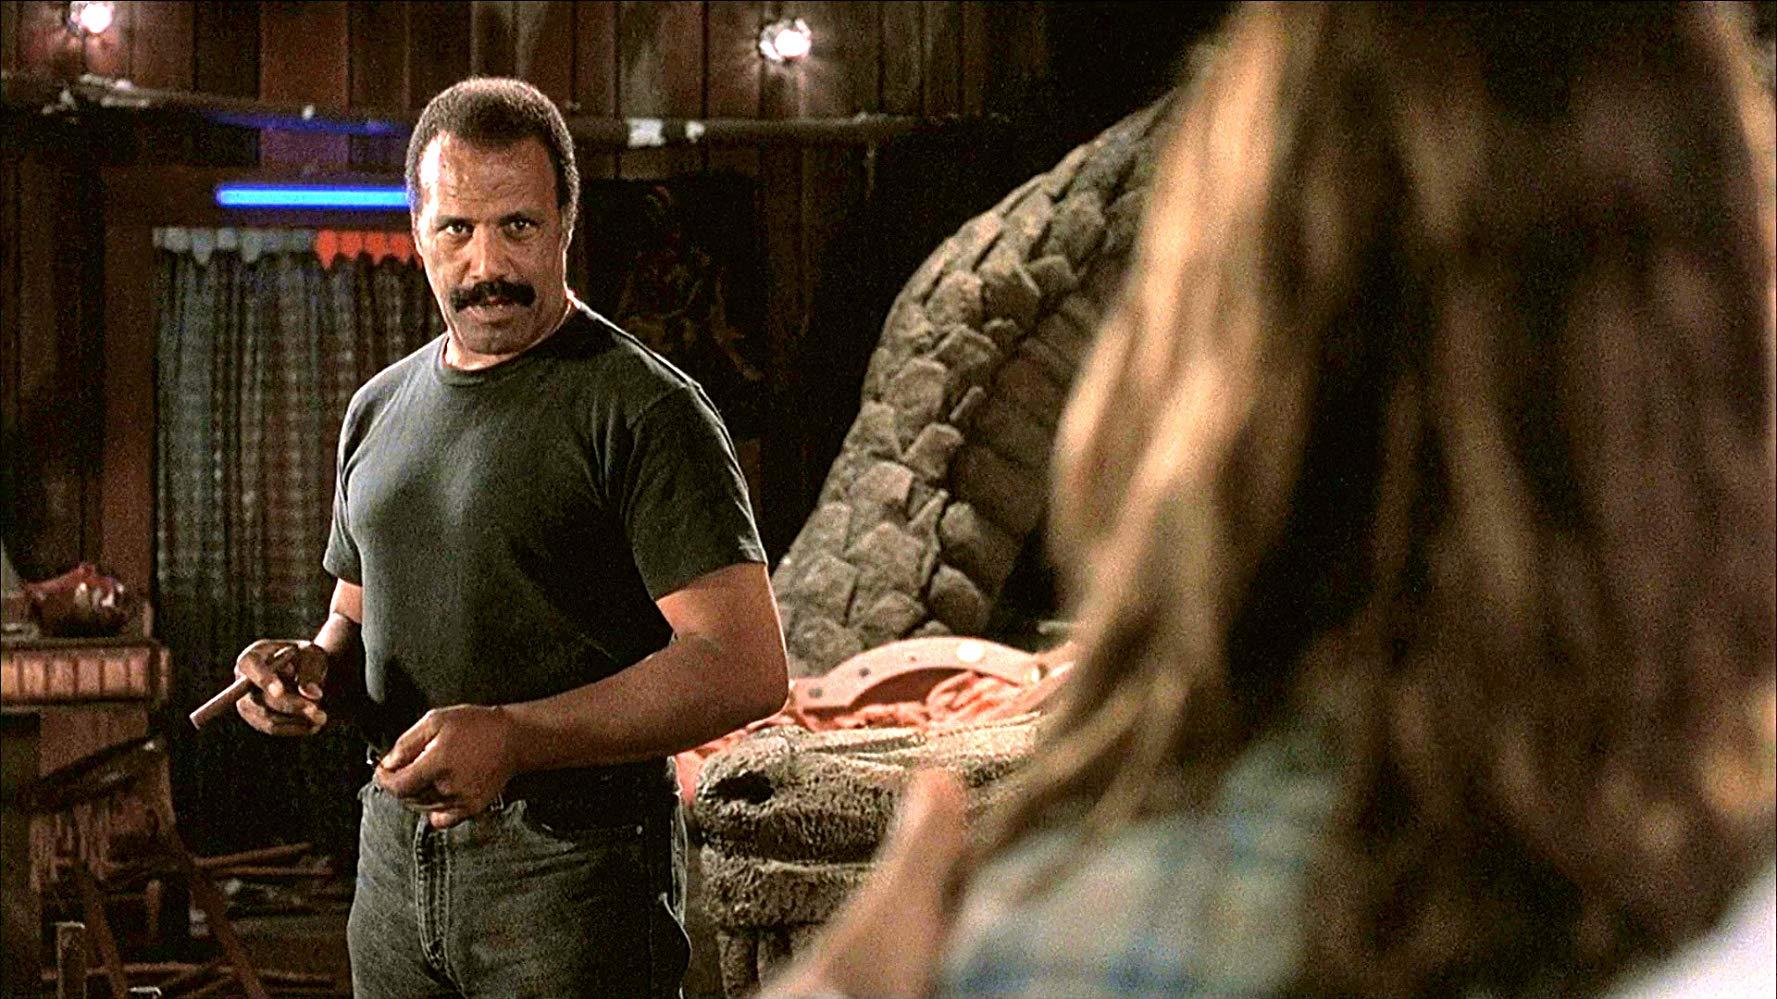 Fred Williamson, William Sadler, Martin Kove and More Join Stephen Lang in Horror Film 'V.F.W.'